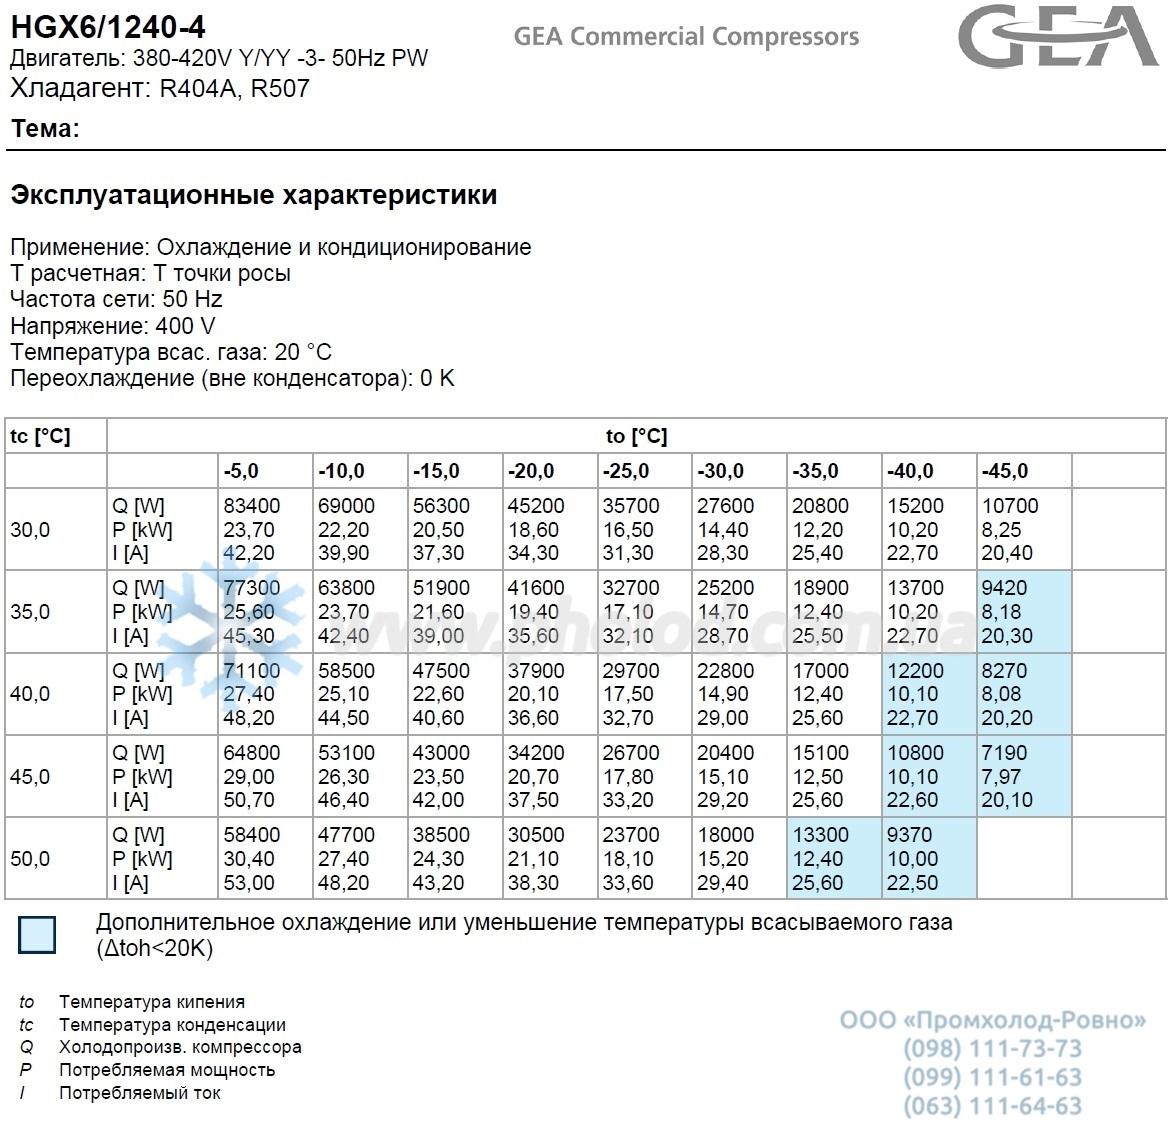 HGX6 1240-4 - 2